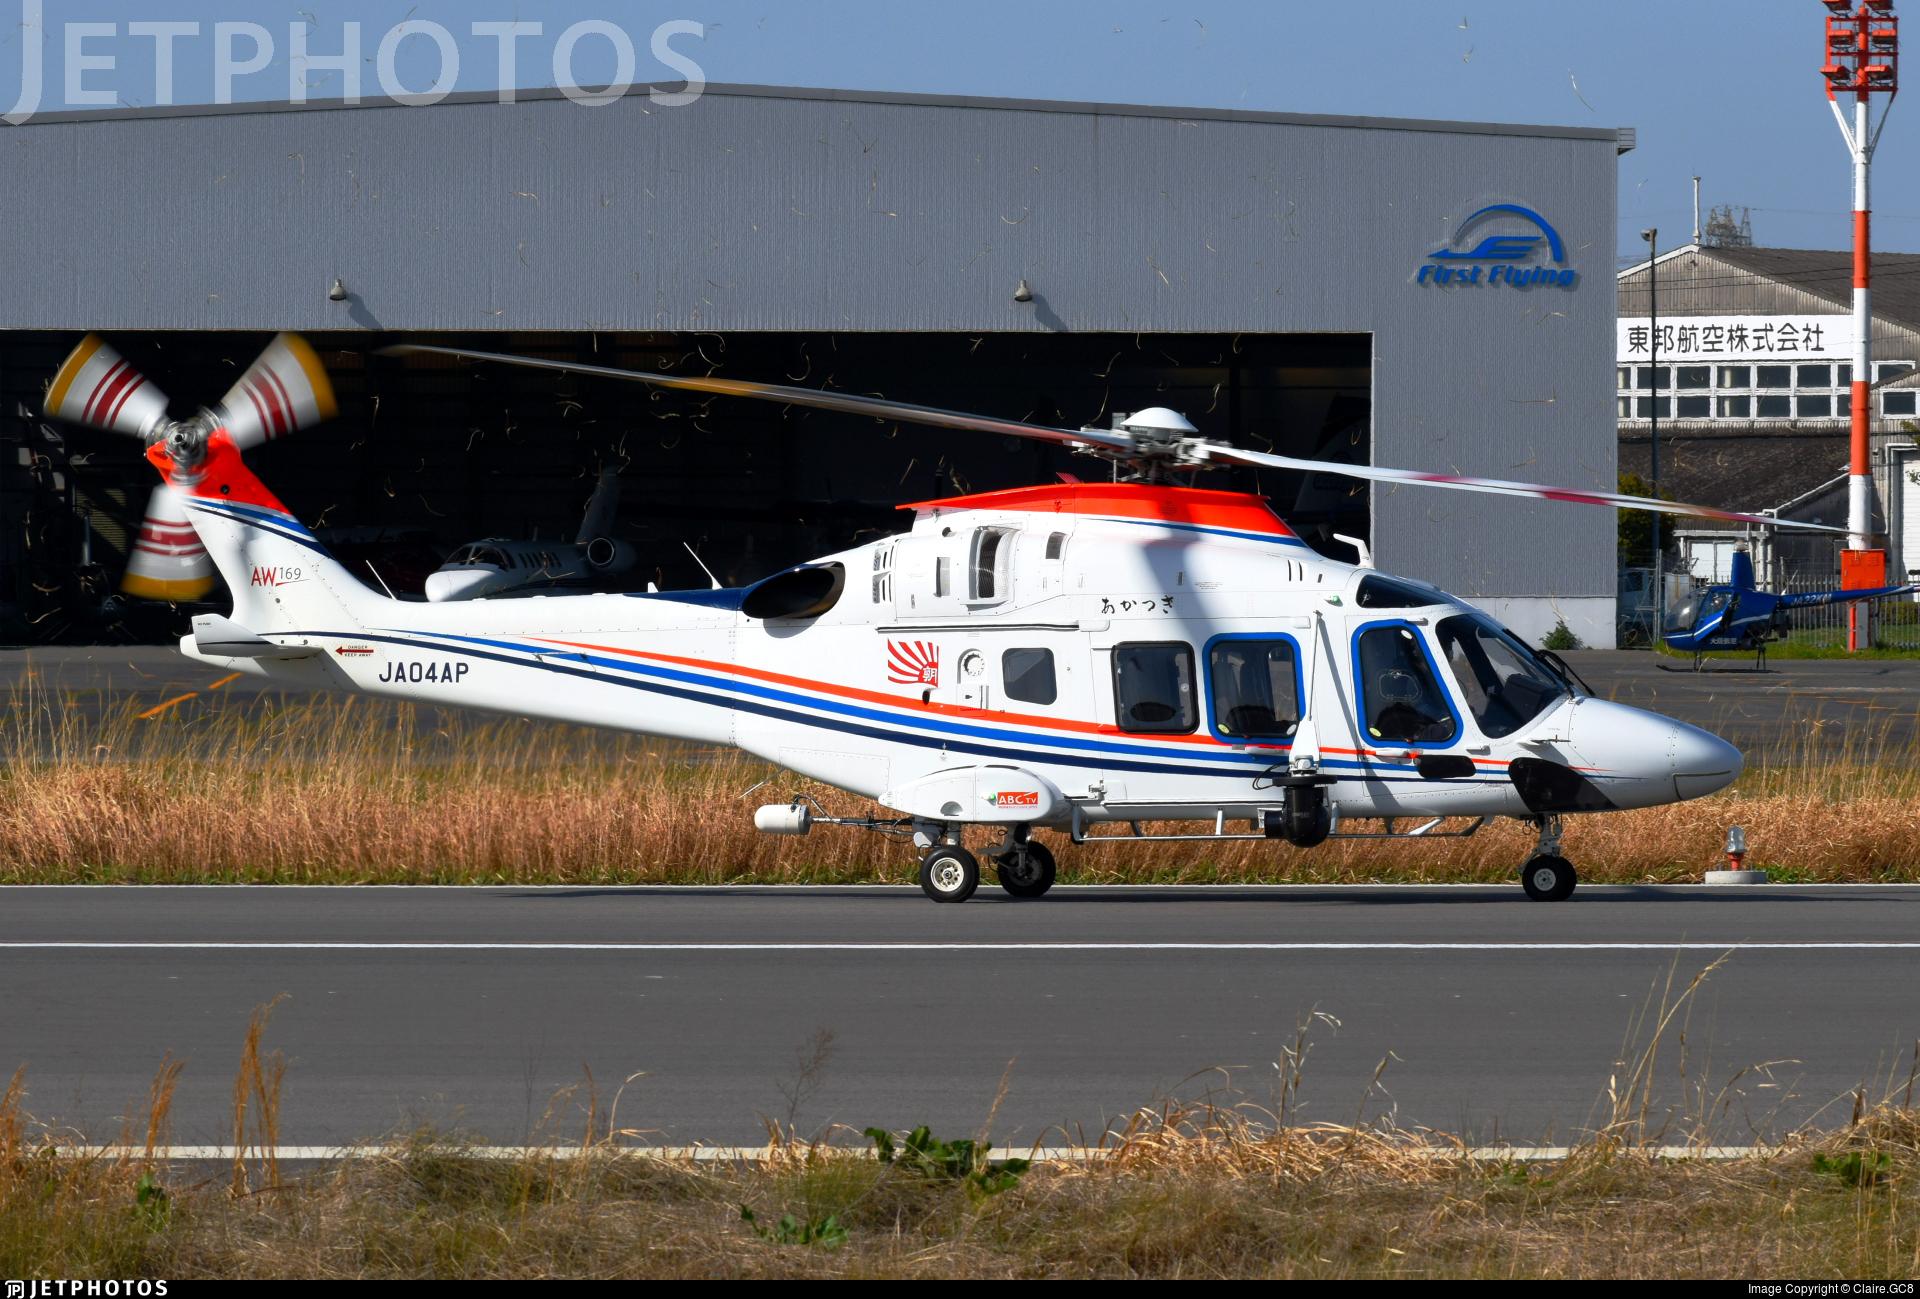 JA04AP - Agusta-Westland AW-169 - Private